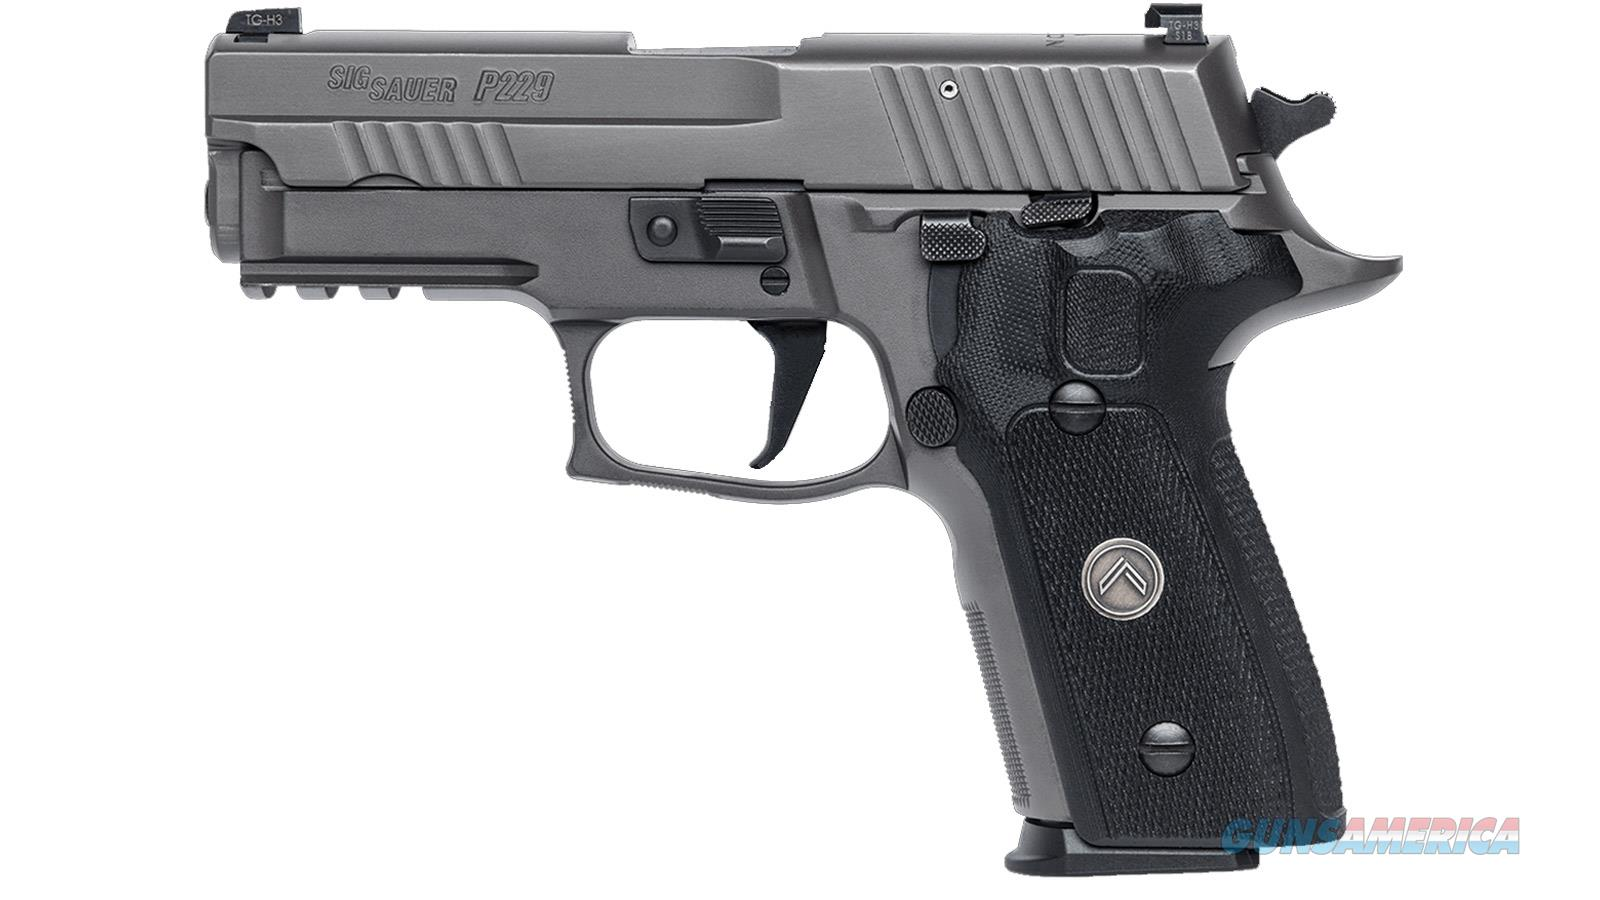 "Sig Sauer P229 Pistol, 9Mm, 3.9"", Legion, Gray , Sao, X-Ray 3, Black G10 Grip, (3) 10Rd Steel Mag, Srt 229R-9-LEGION-SAO  Guns > Pistols > S Misc Pistols"